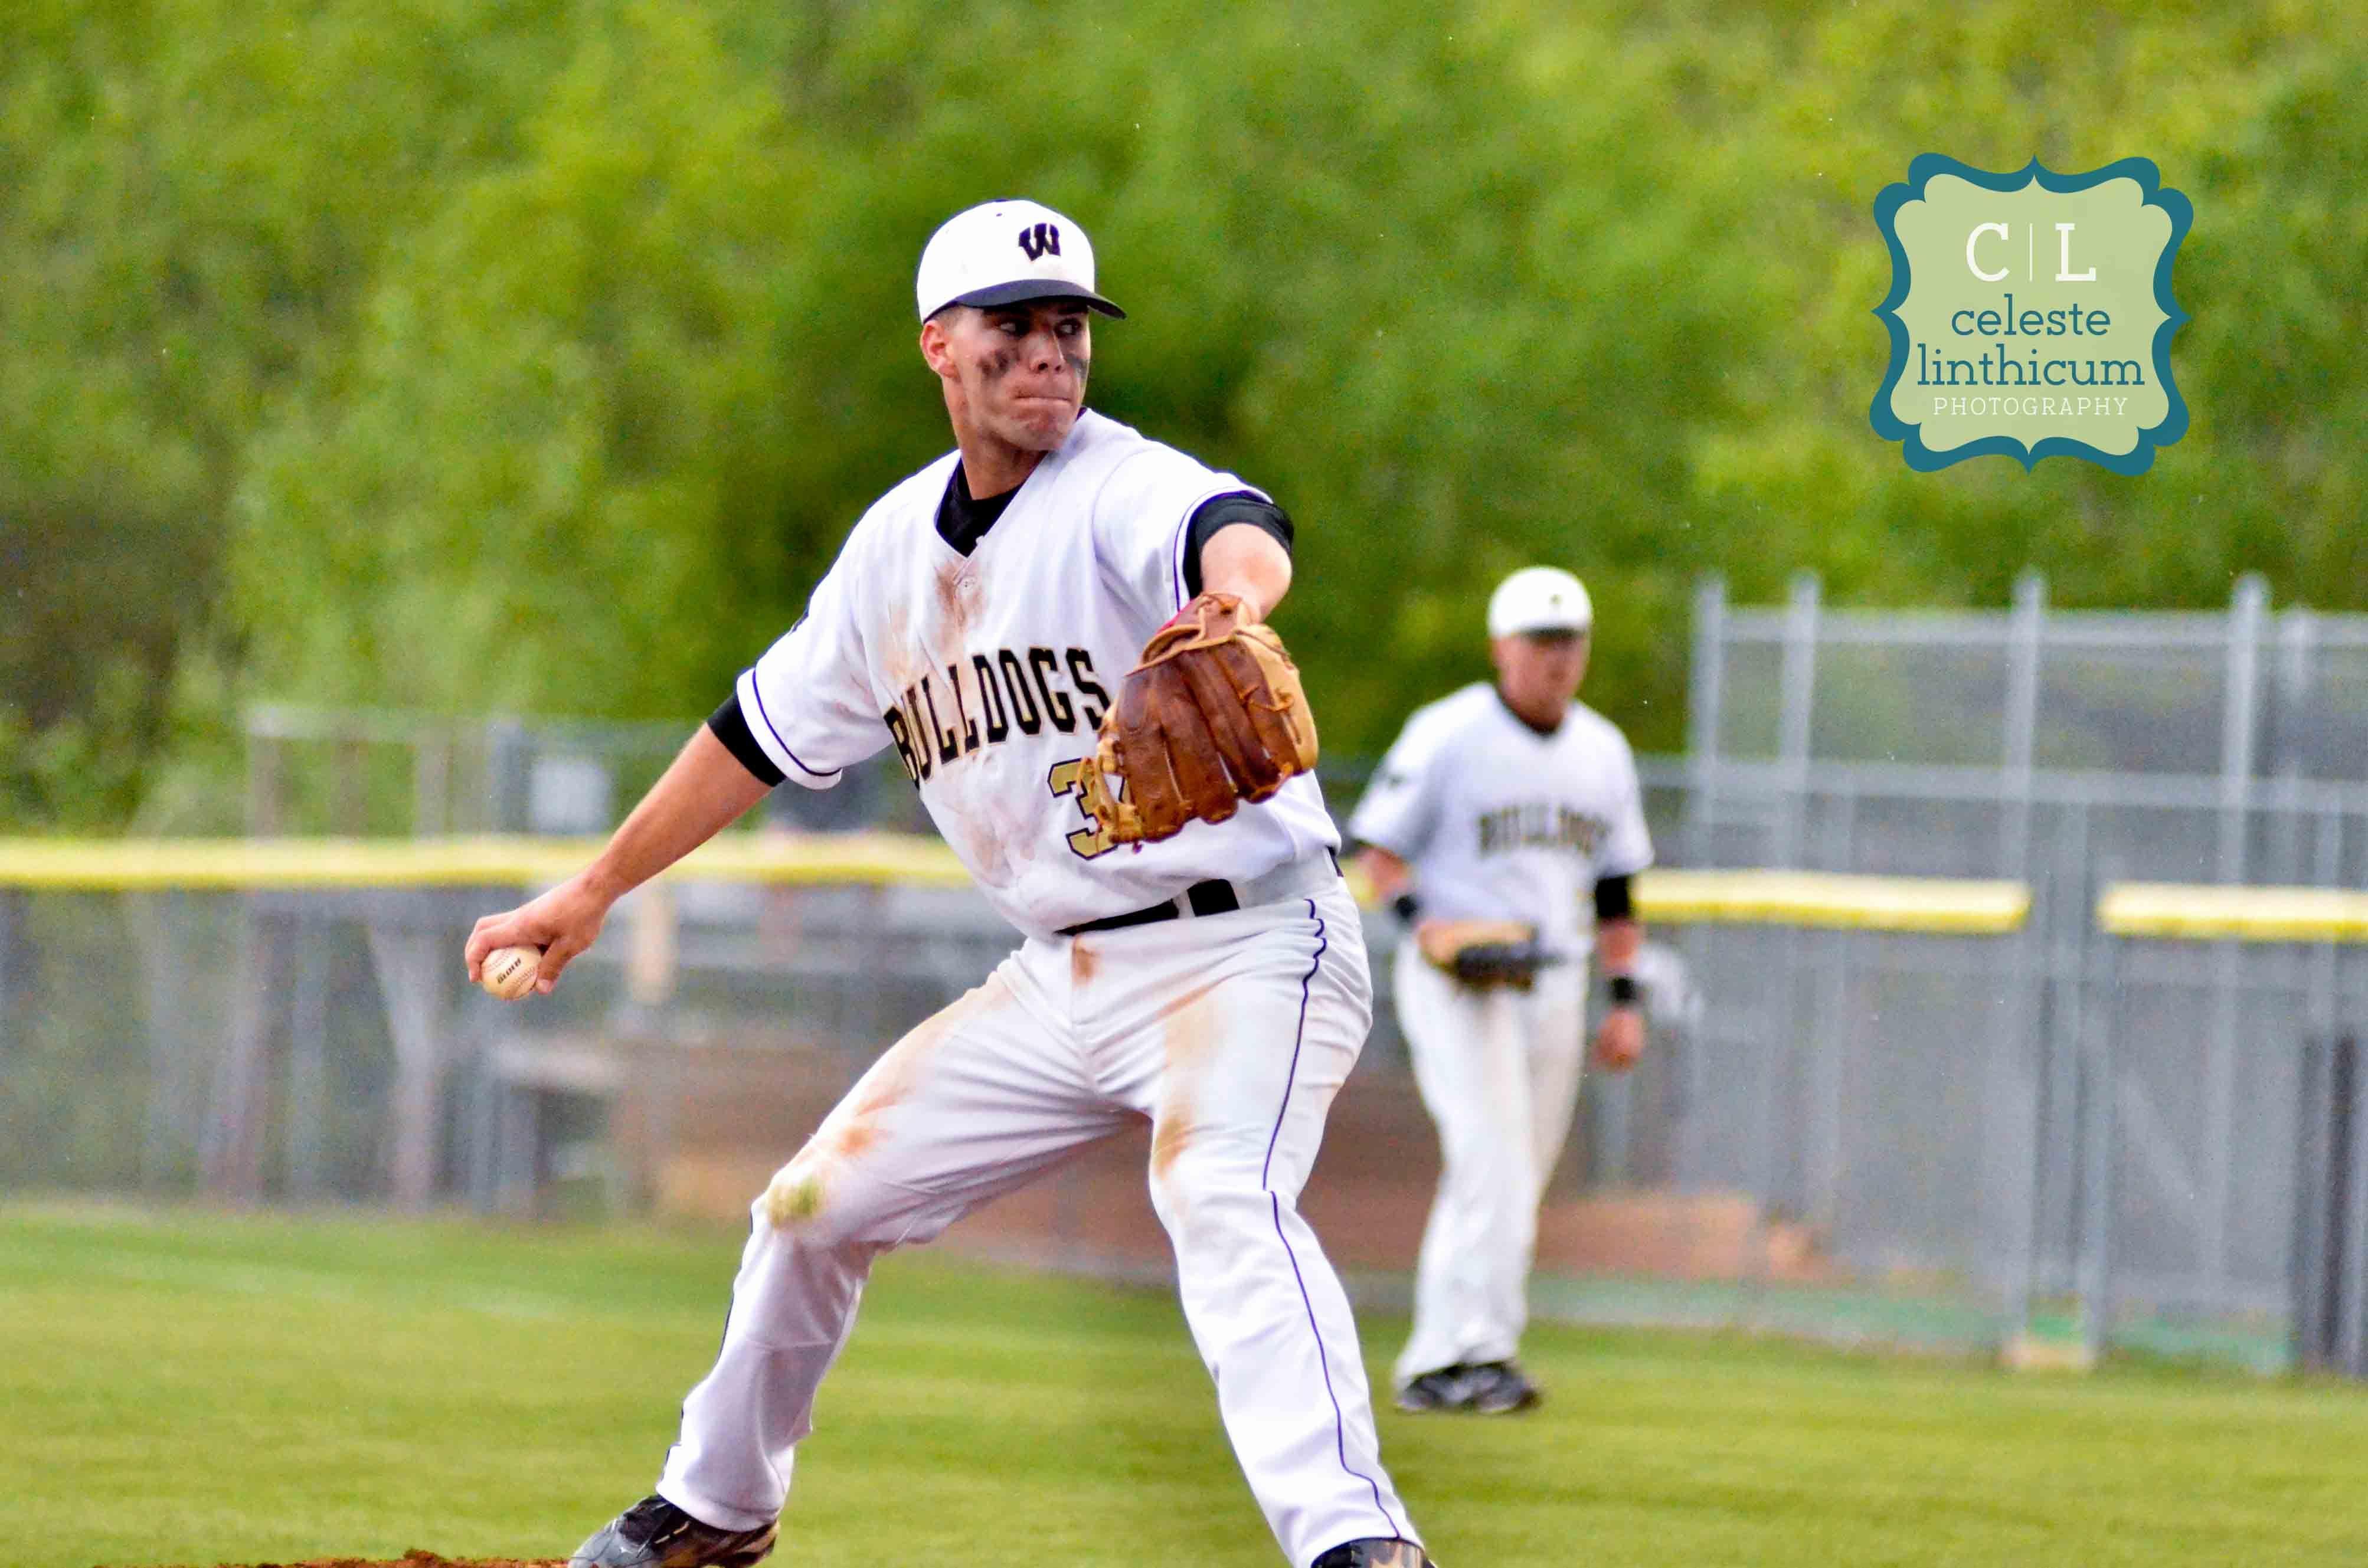 Baseball Chantilly Va Northern Virginia Photographer Www Celestelinthicumphotography Com Sports Northern Virginia Sports Jersey